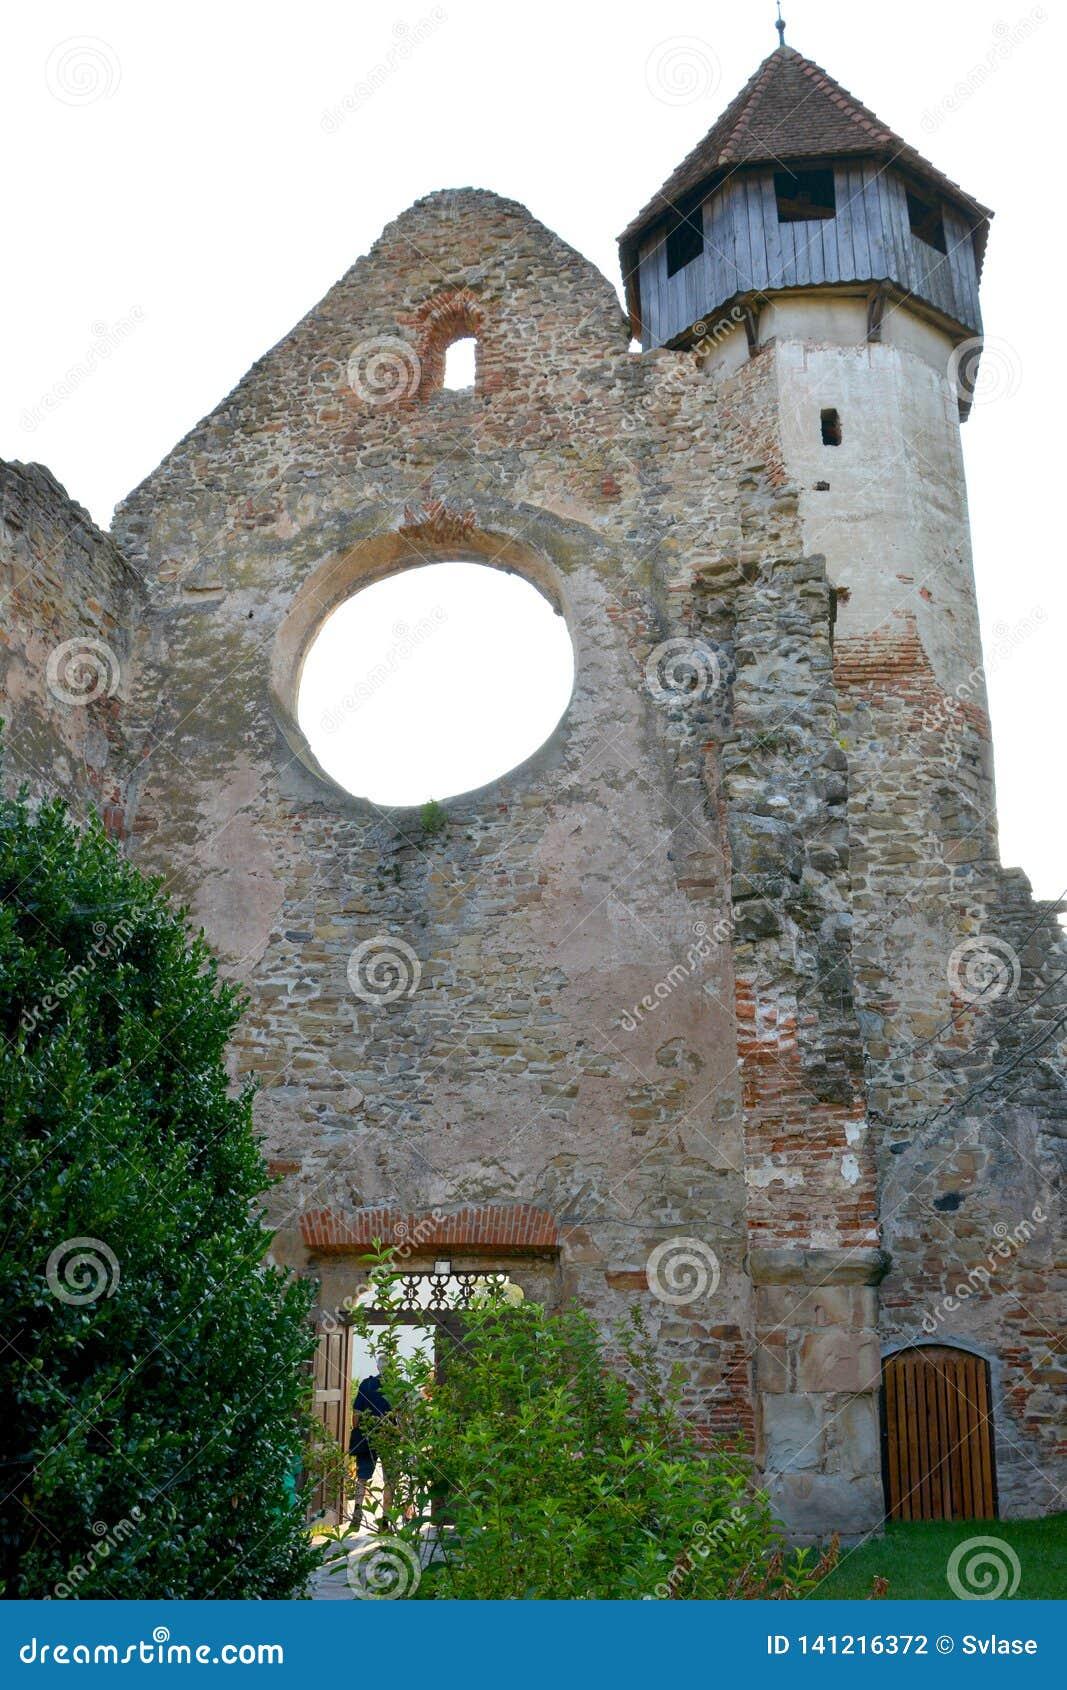 Walls. Ruins of medieval cistercian abbey in Transylvania.